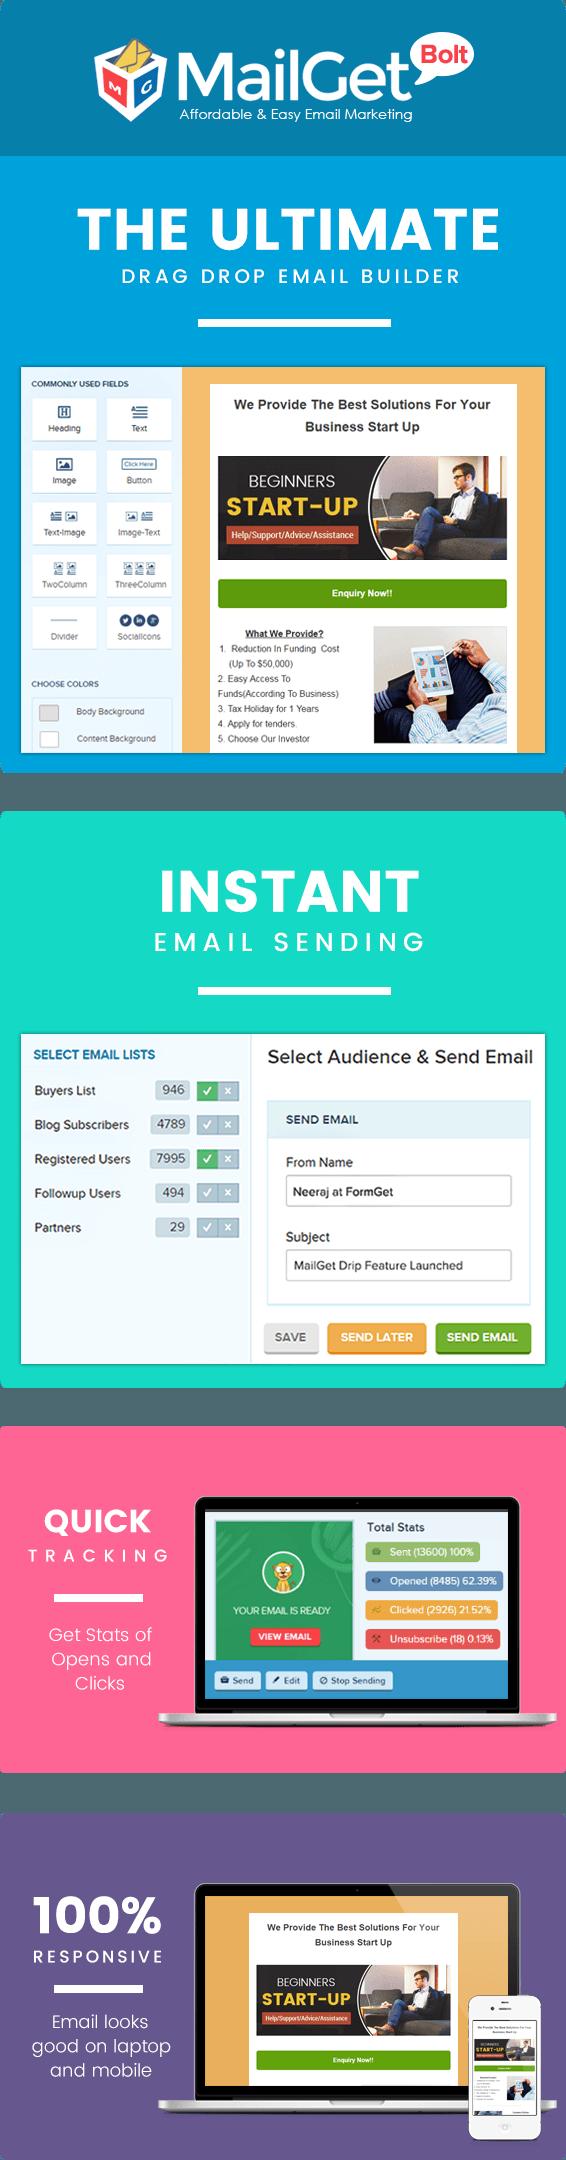 Email marketing for Beginner SalesPage